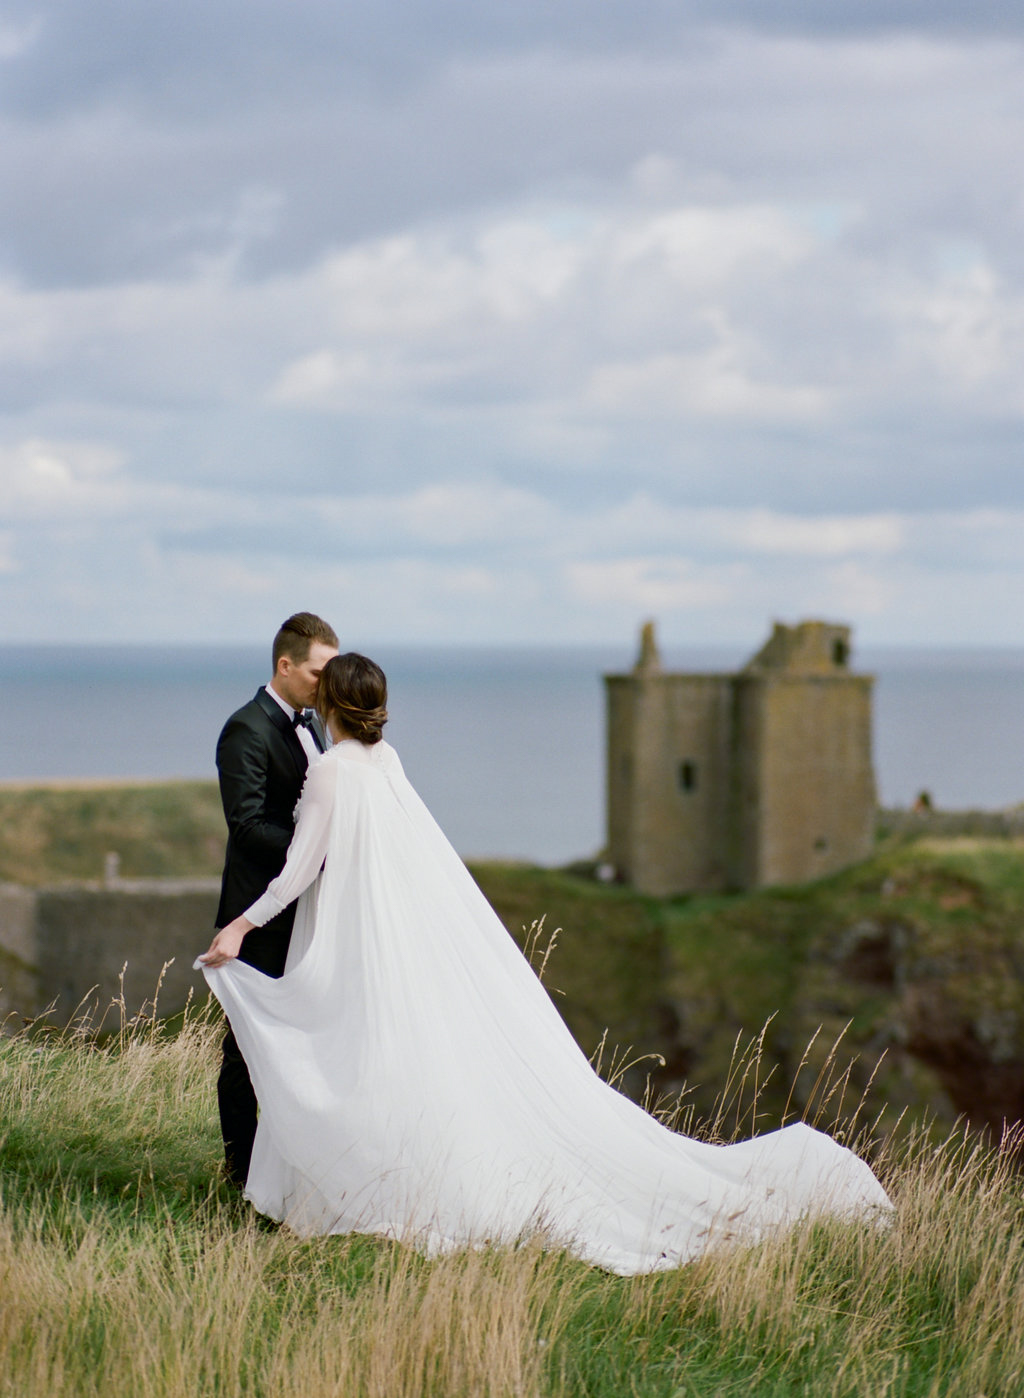 Scotland-Prewedding-highlands-castle-Engagment-Photos-Katie-Grant (109 of 139).jpg